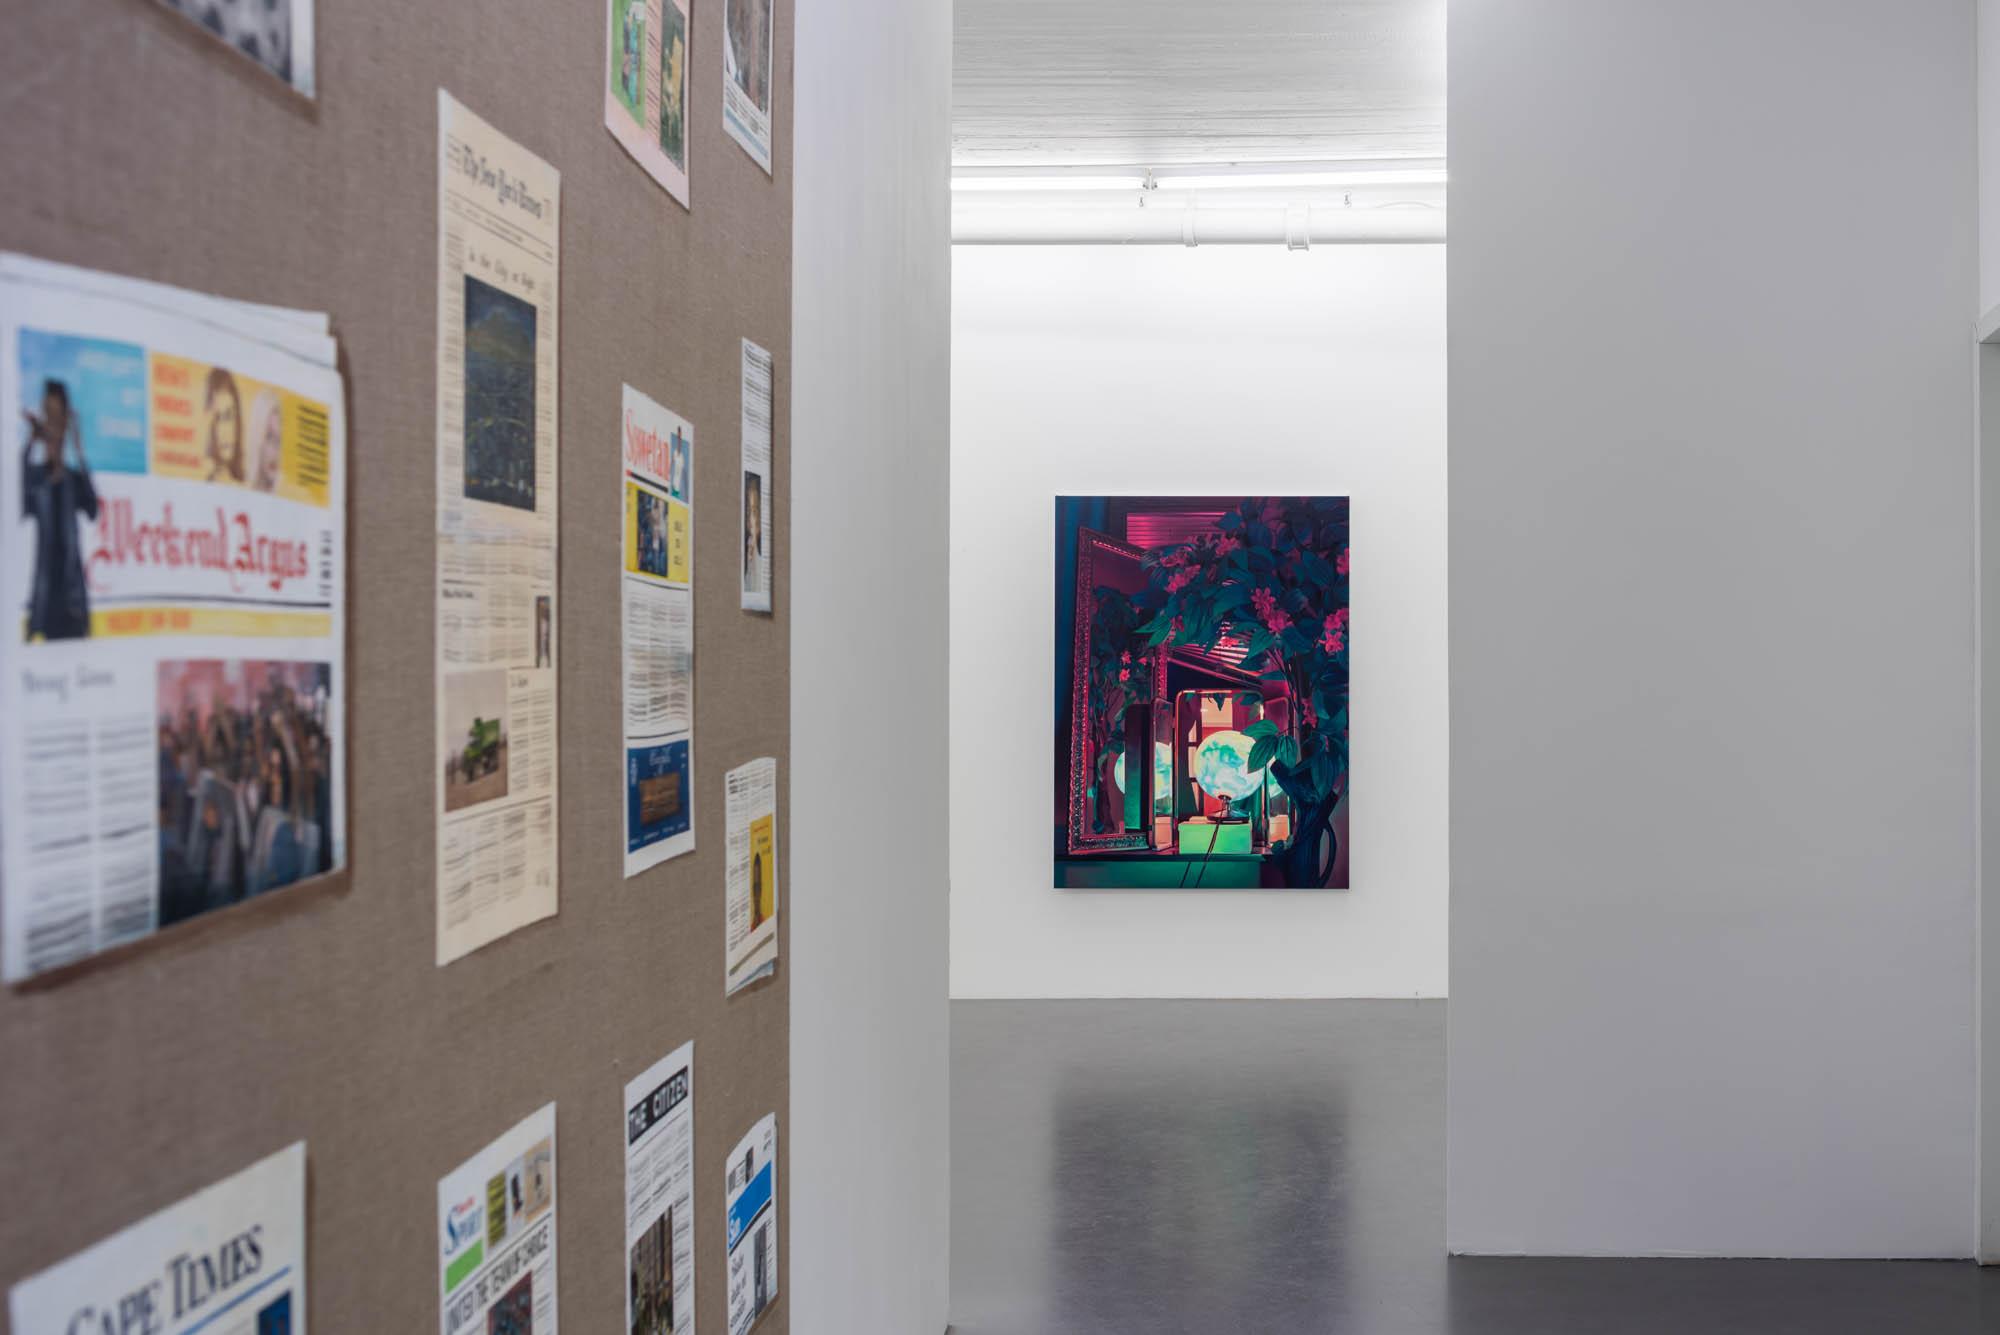 Installation view; Tom cullberg and Pauliina Pietilä, 2016